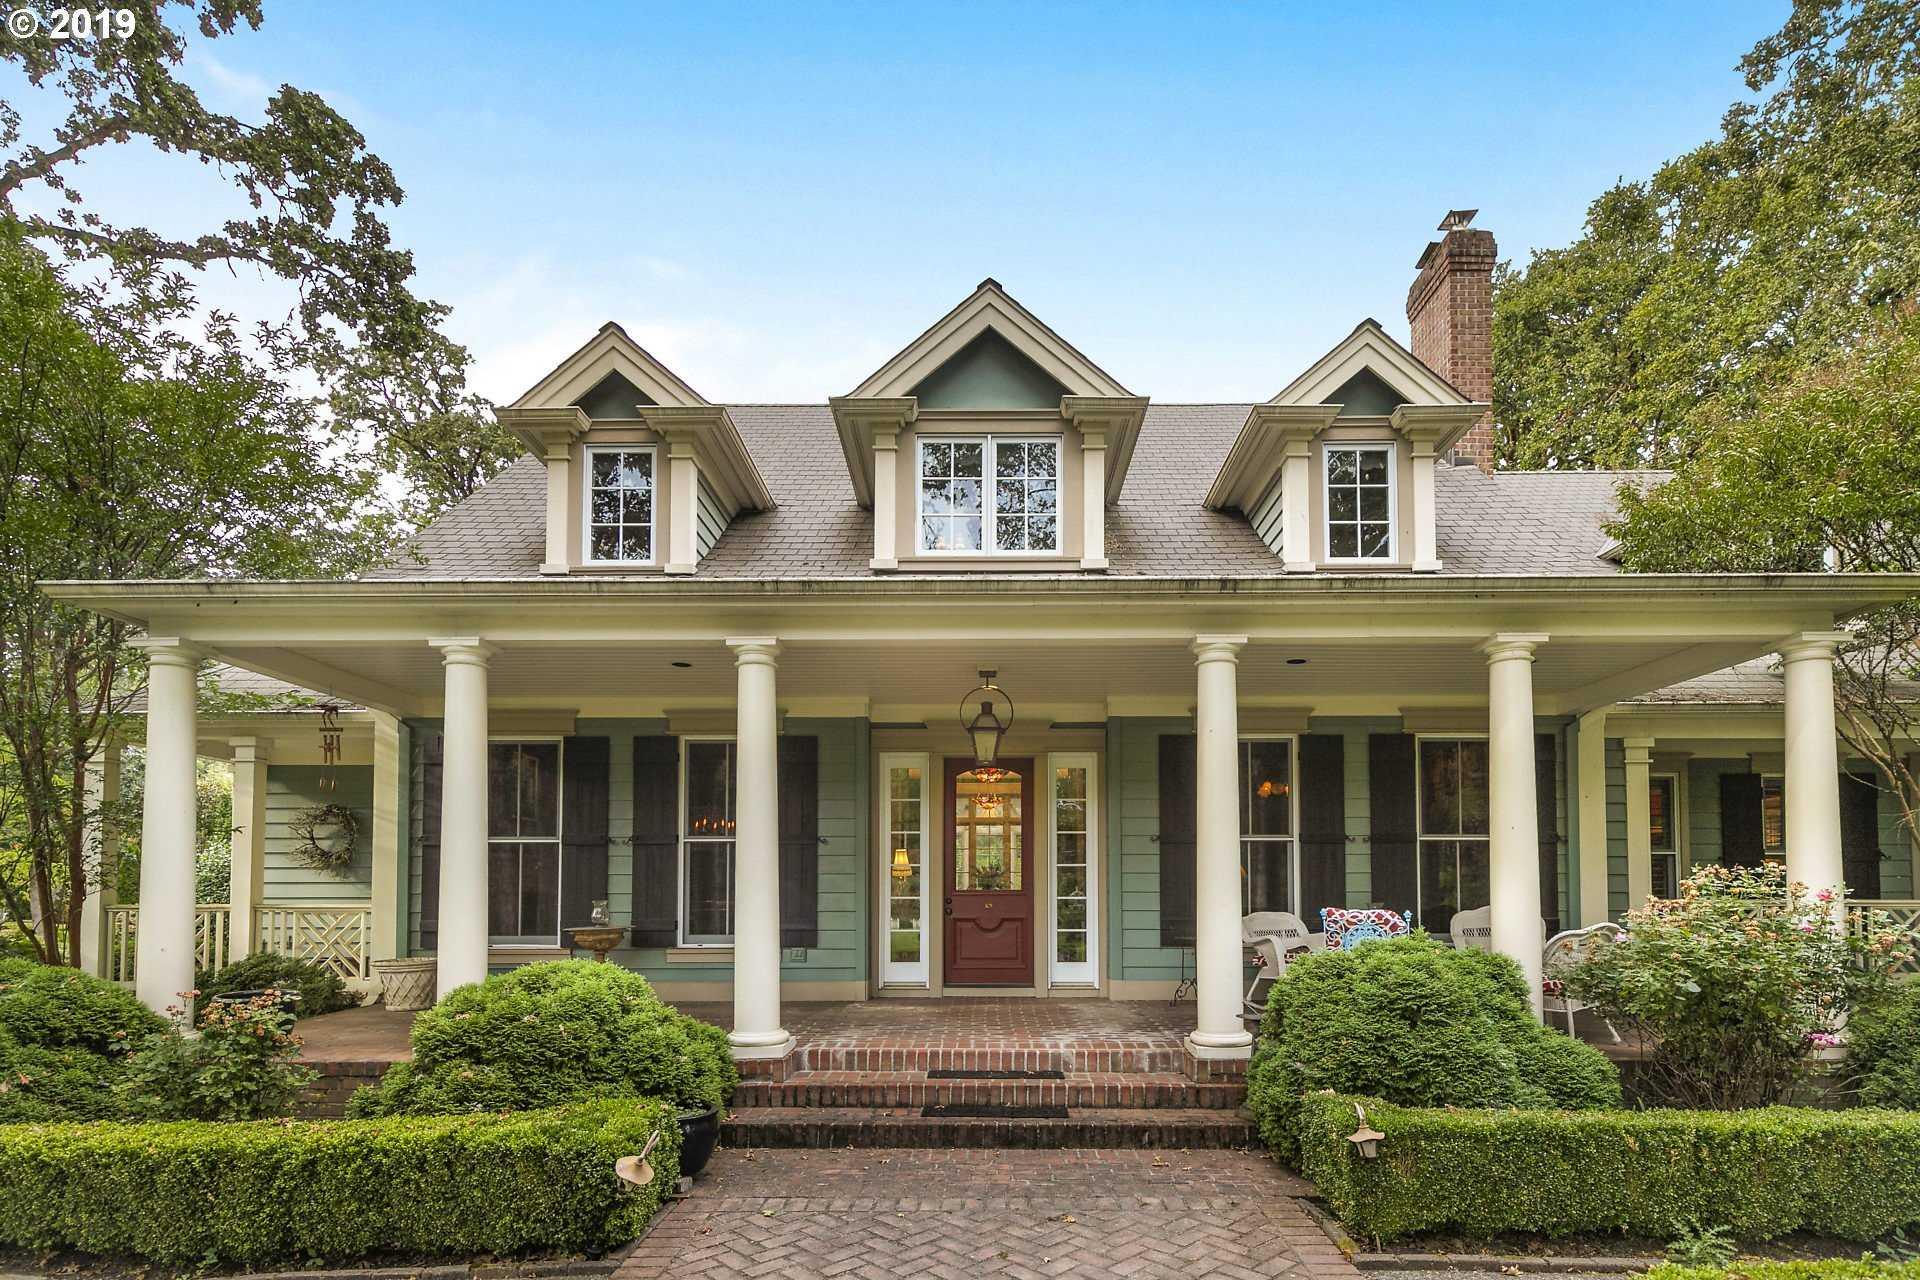 $1,450,000 - 4Br/4Ba -  for Sale in Newberg